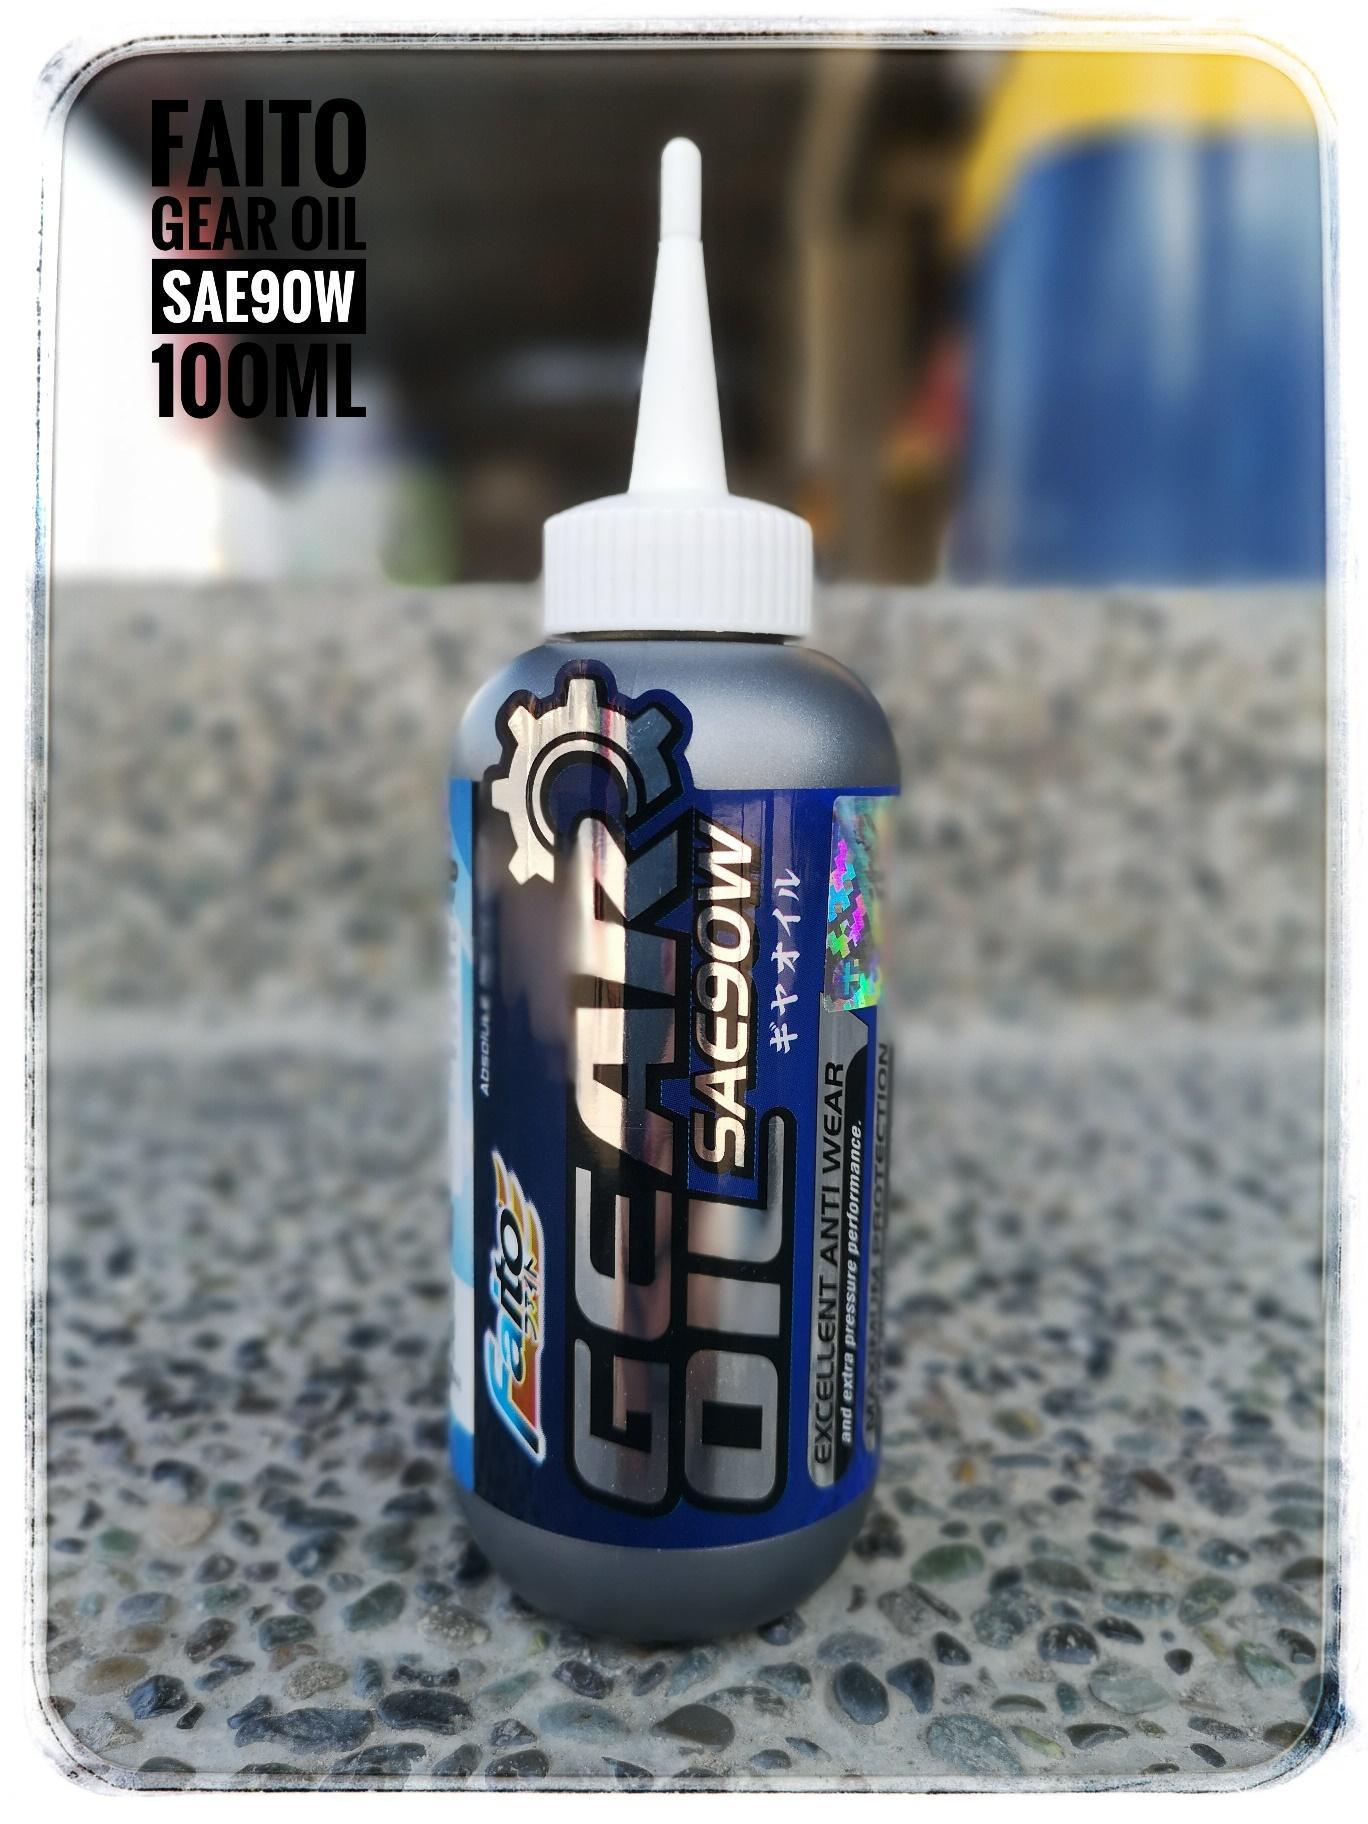 Gear Oils - Buy Gear Oils at Best Price in Philippines | www lazada